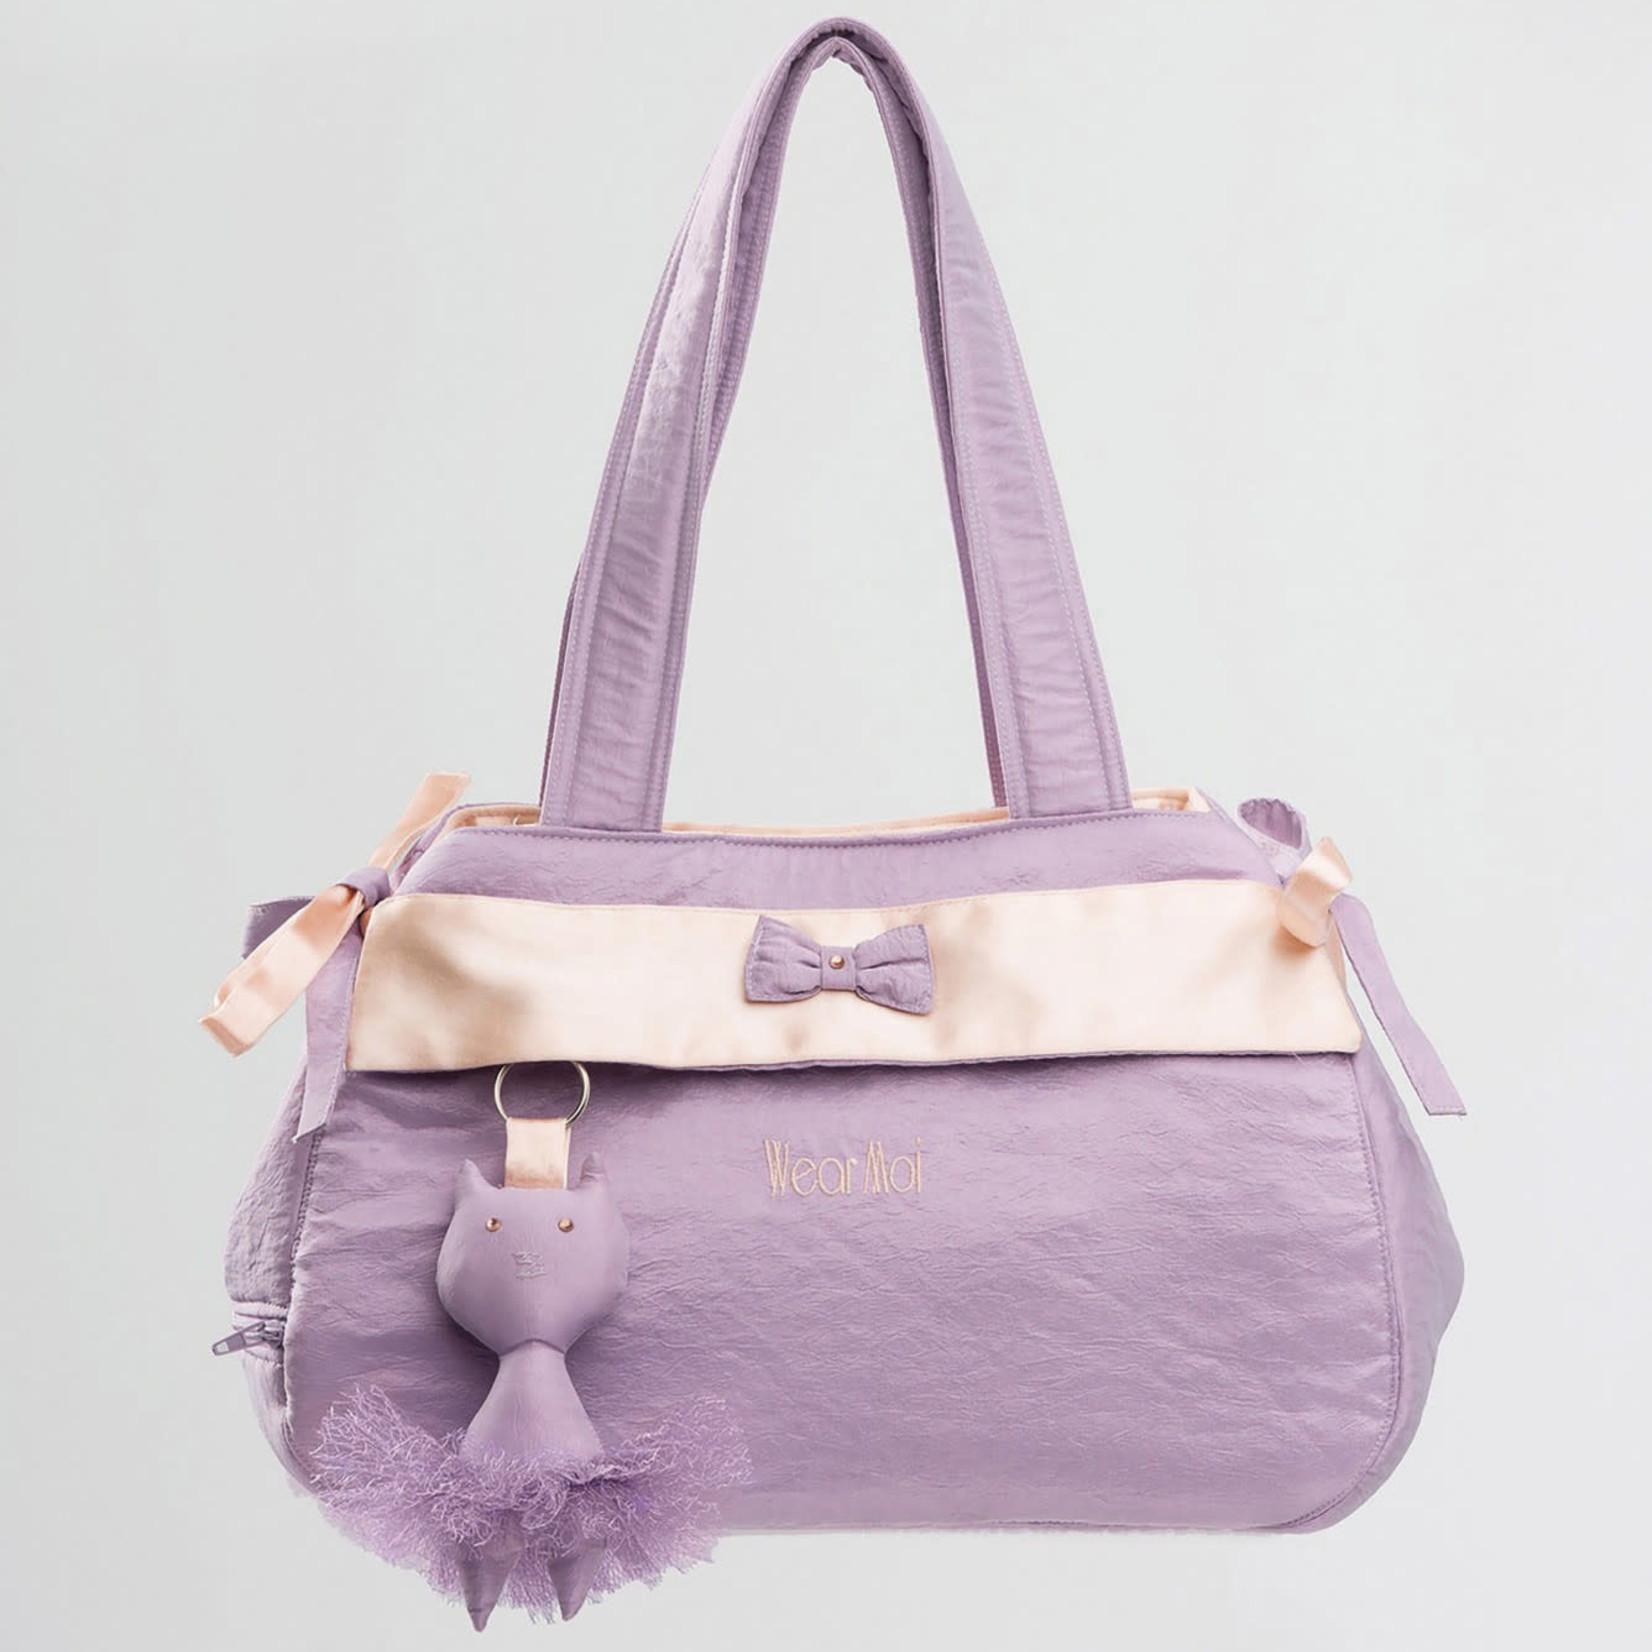 Wear Moi Wear Moi DIV67 Lilac/Salmon Taffetas Bag